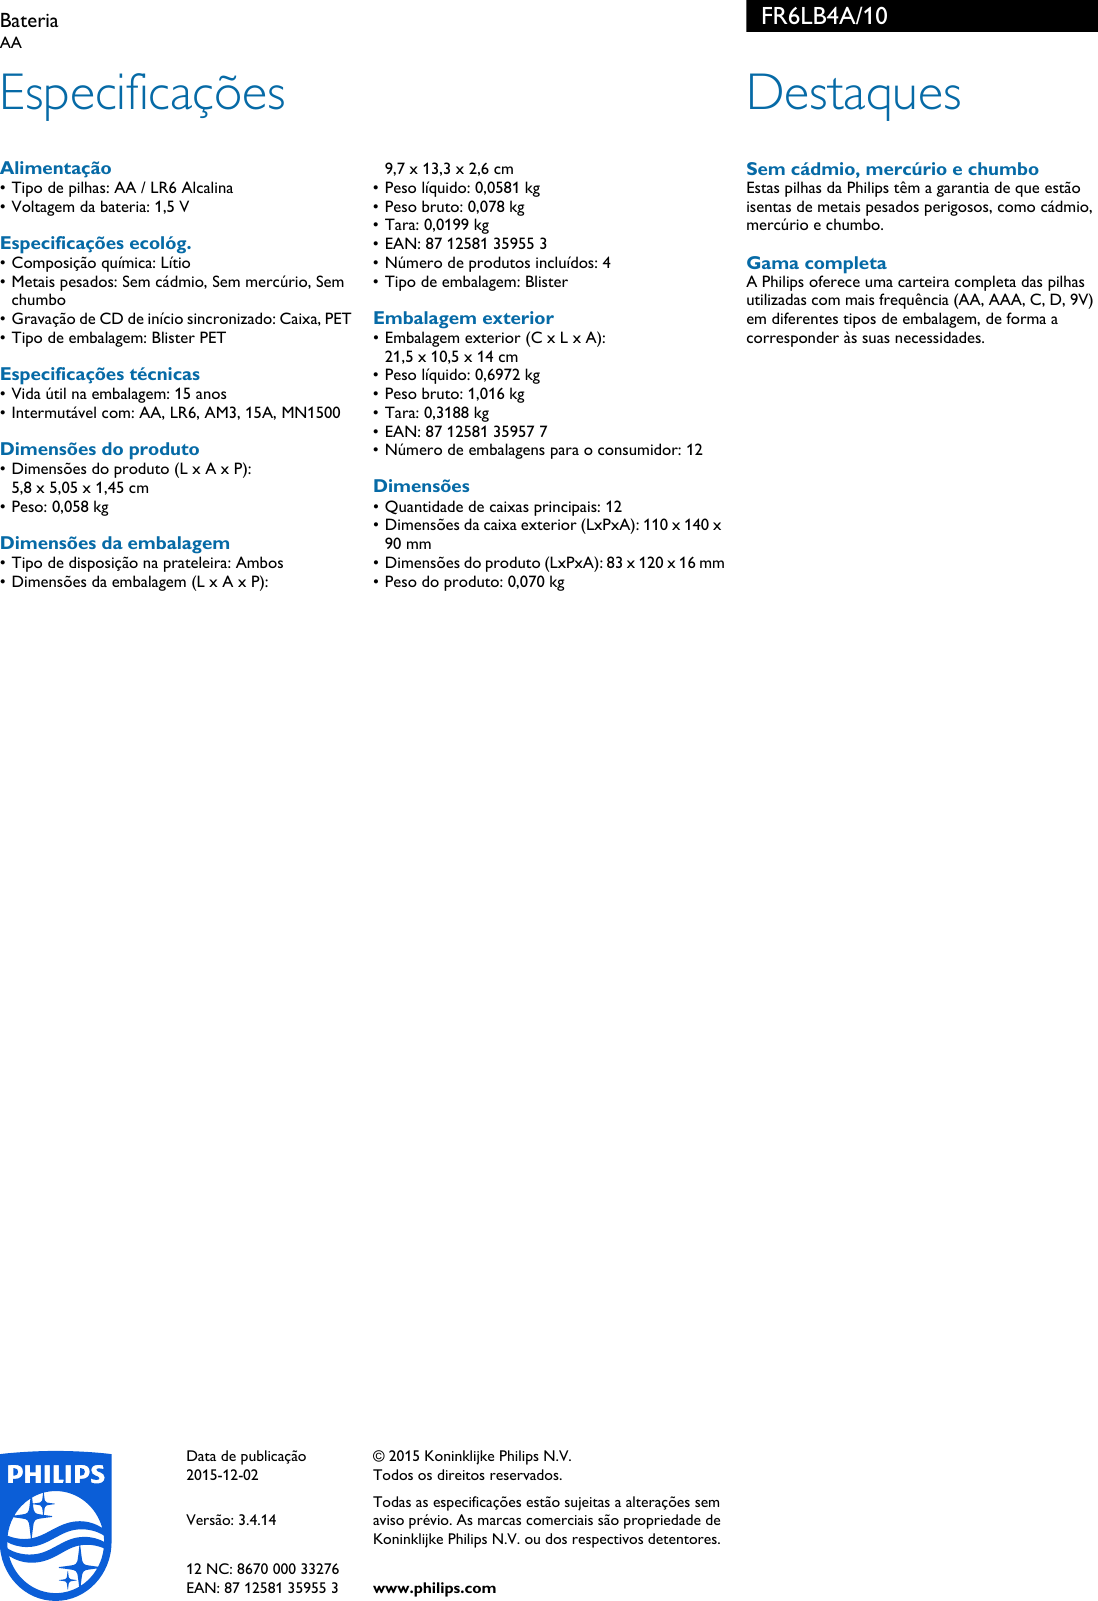 Page 2 of 2 - Philips FR6LB4A 10 Bateria User Manual Folheto Fr6lb4a 10 Pss c9674686d48f0